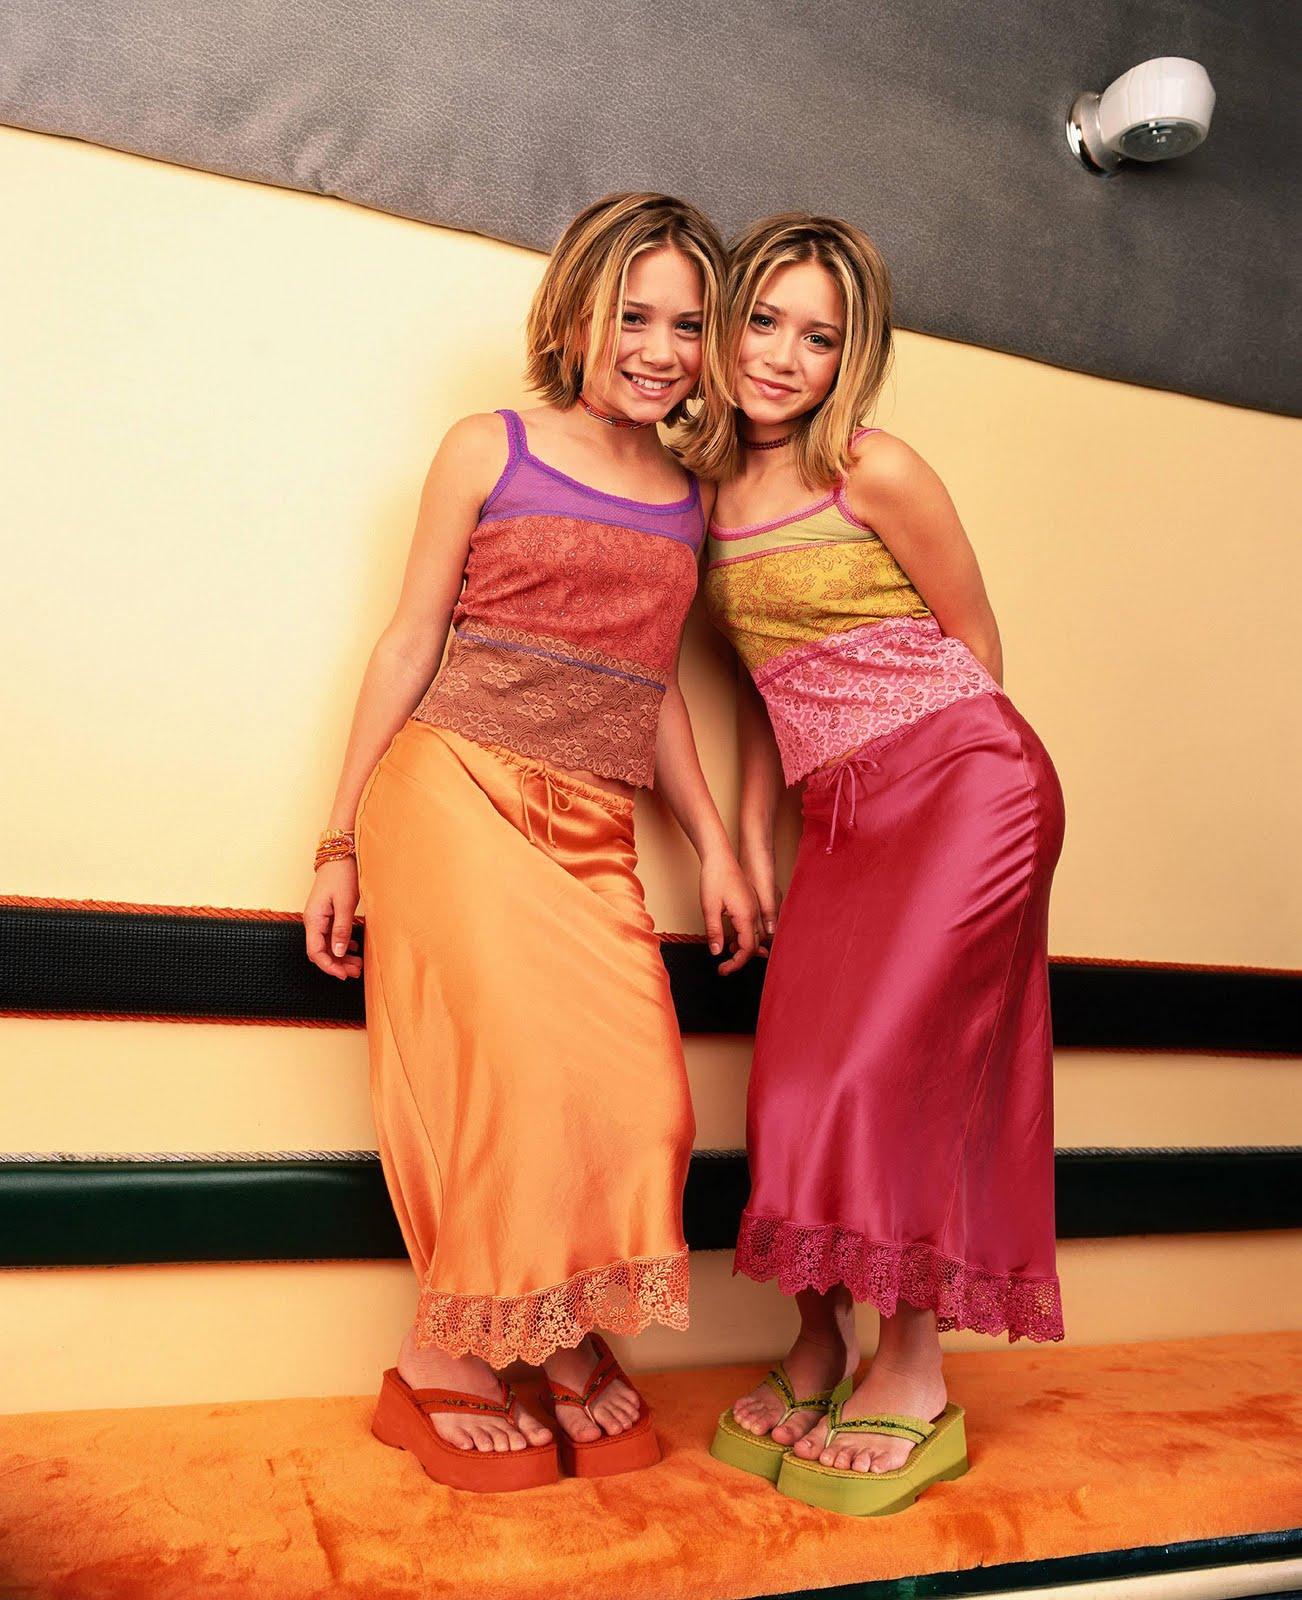 http://4.bp.blogspot.com/-Z3PrFZ4m51w/TsfttH7WTaI/AAAAAAAABsw/ueZXrHZFuGE/s1600/Olsen-twins-stars-childhood-pictures-3288920-1500-1844%2B%25281%2529.jpg